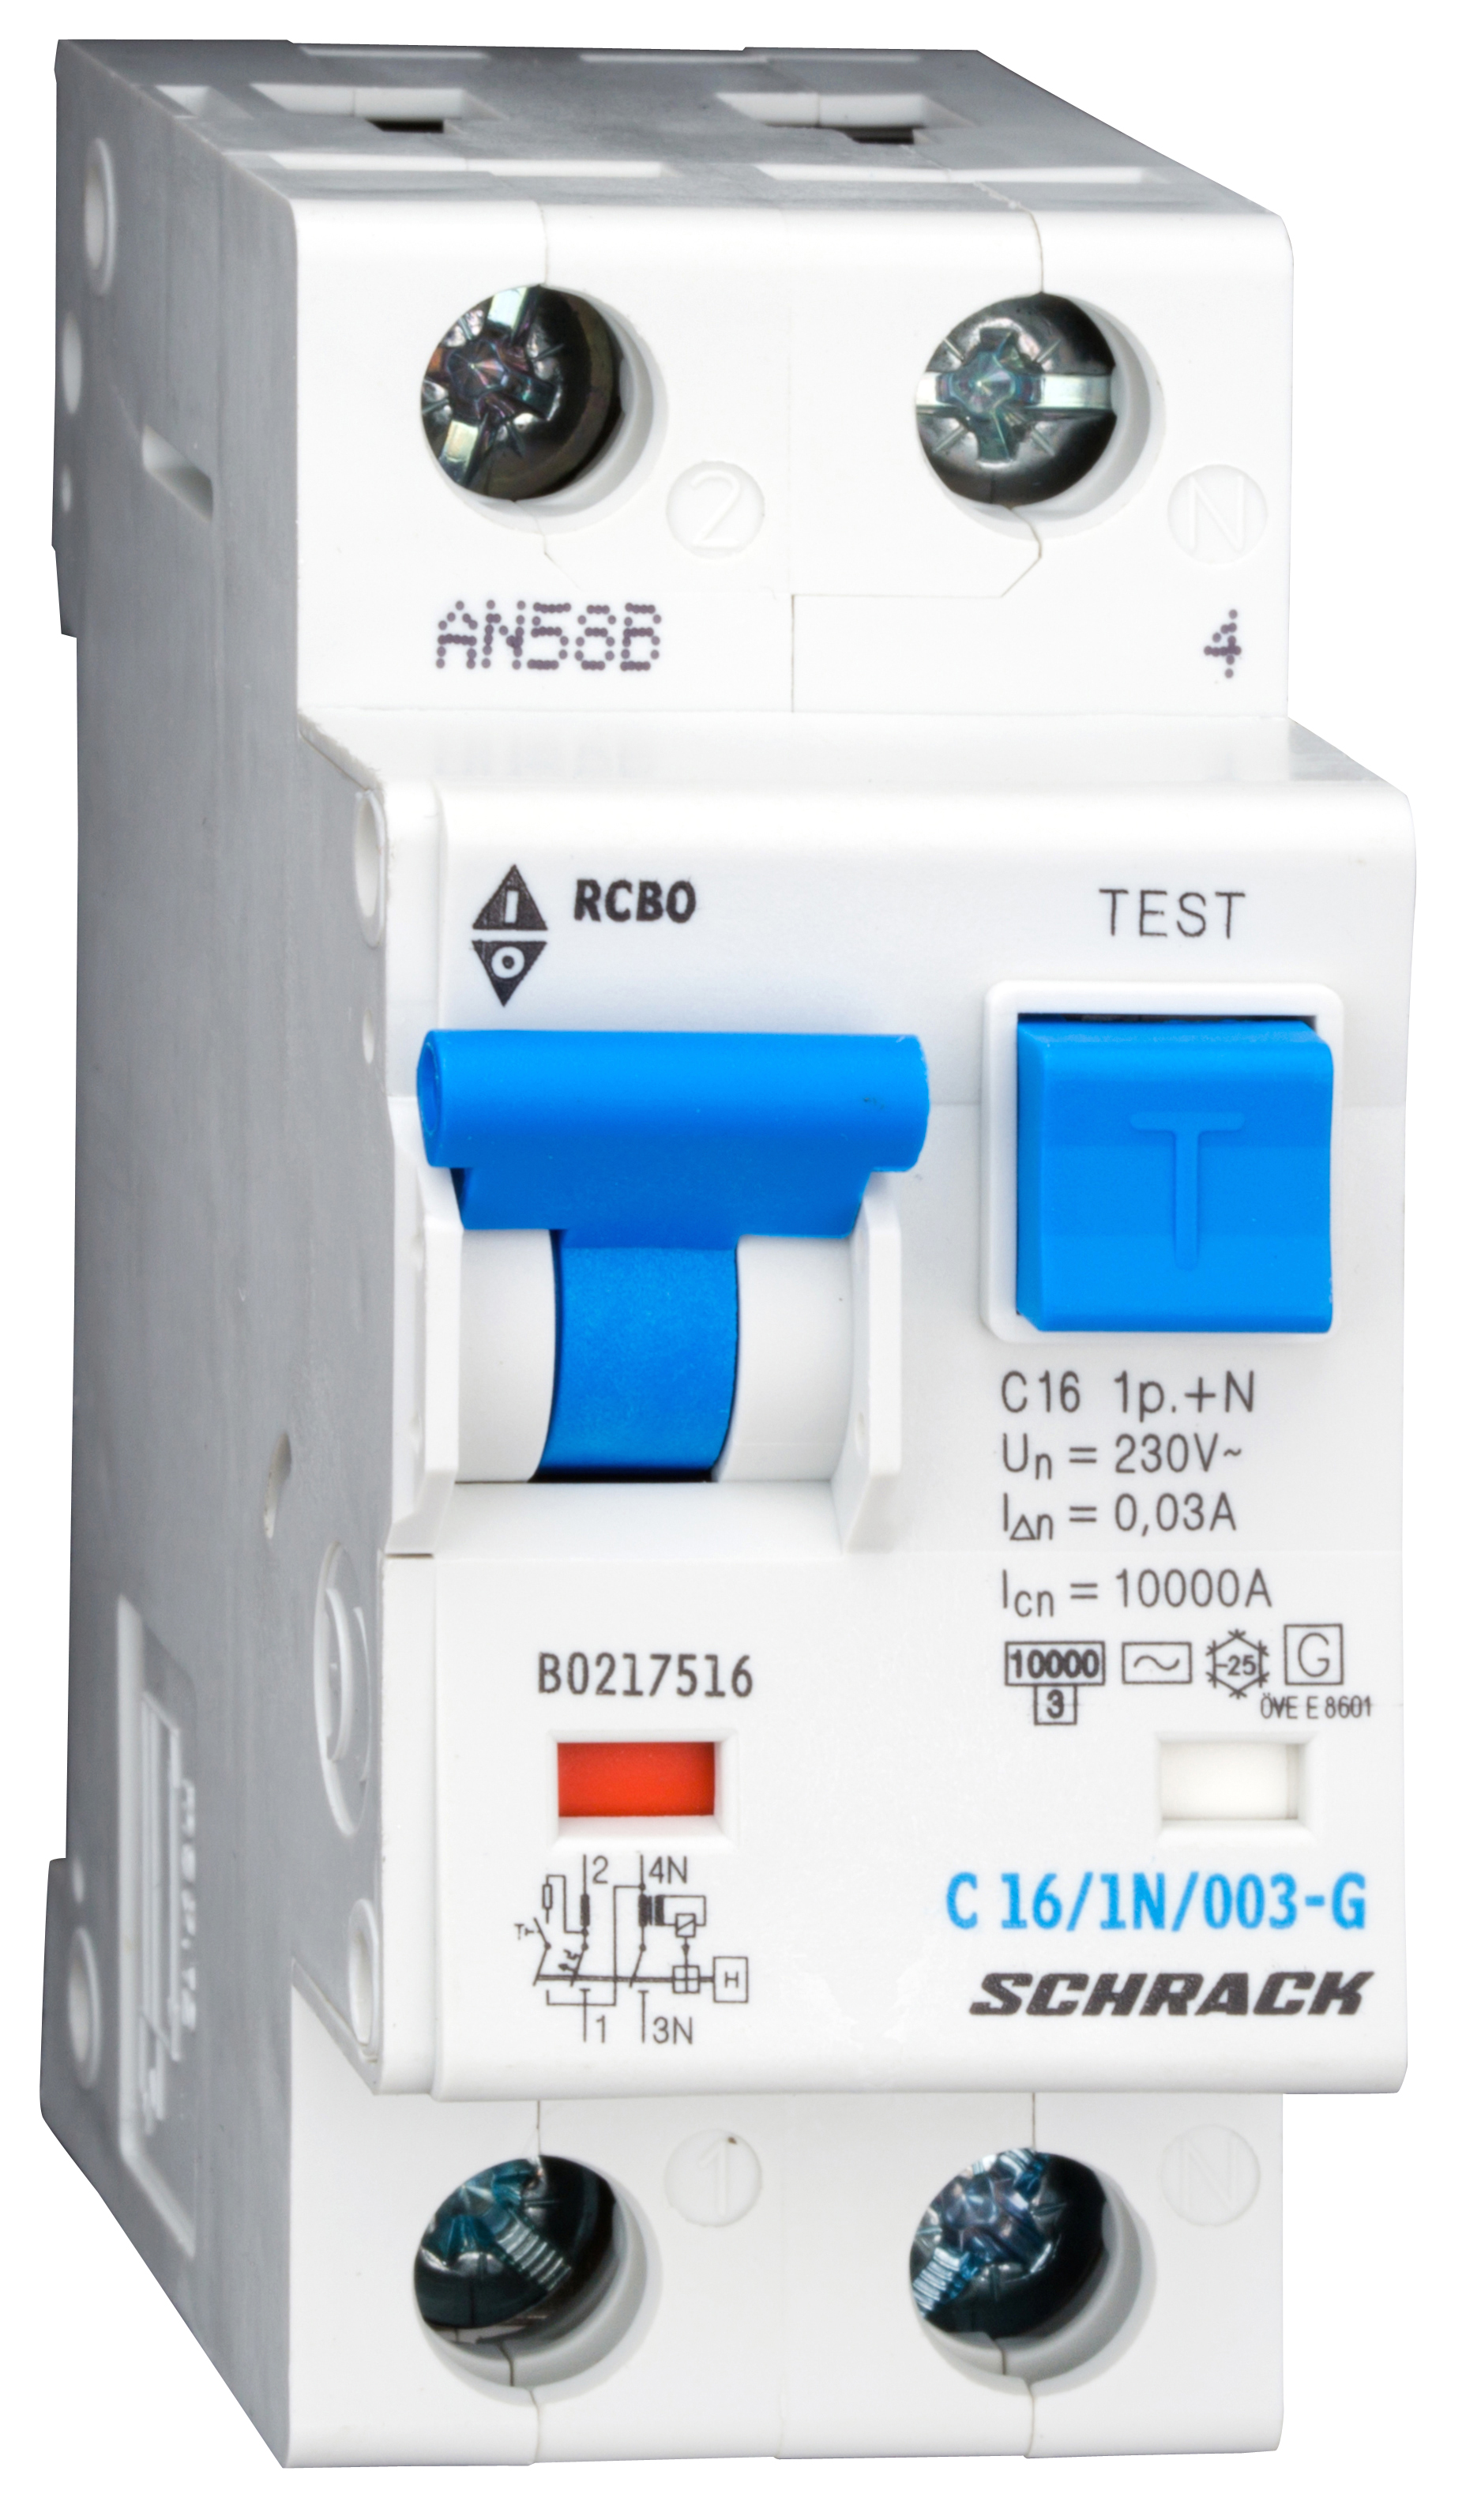 1 Stk LS-FI-Schalter,Kennl. C, 16A,30mA,1-polig+N, Bauart G,Typ AC BO217516--